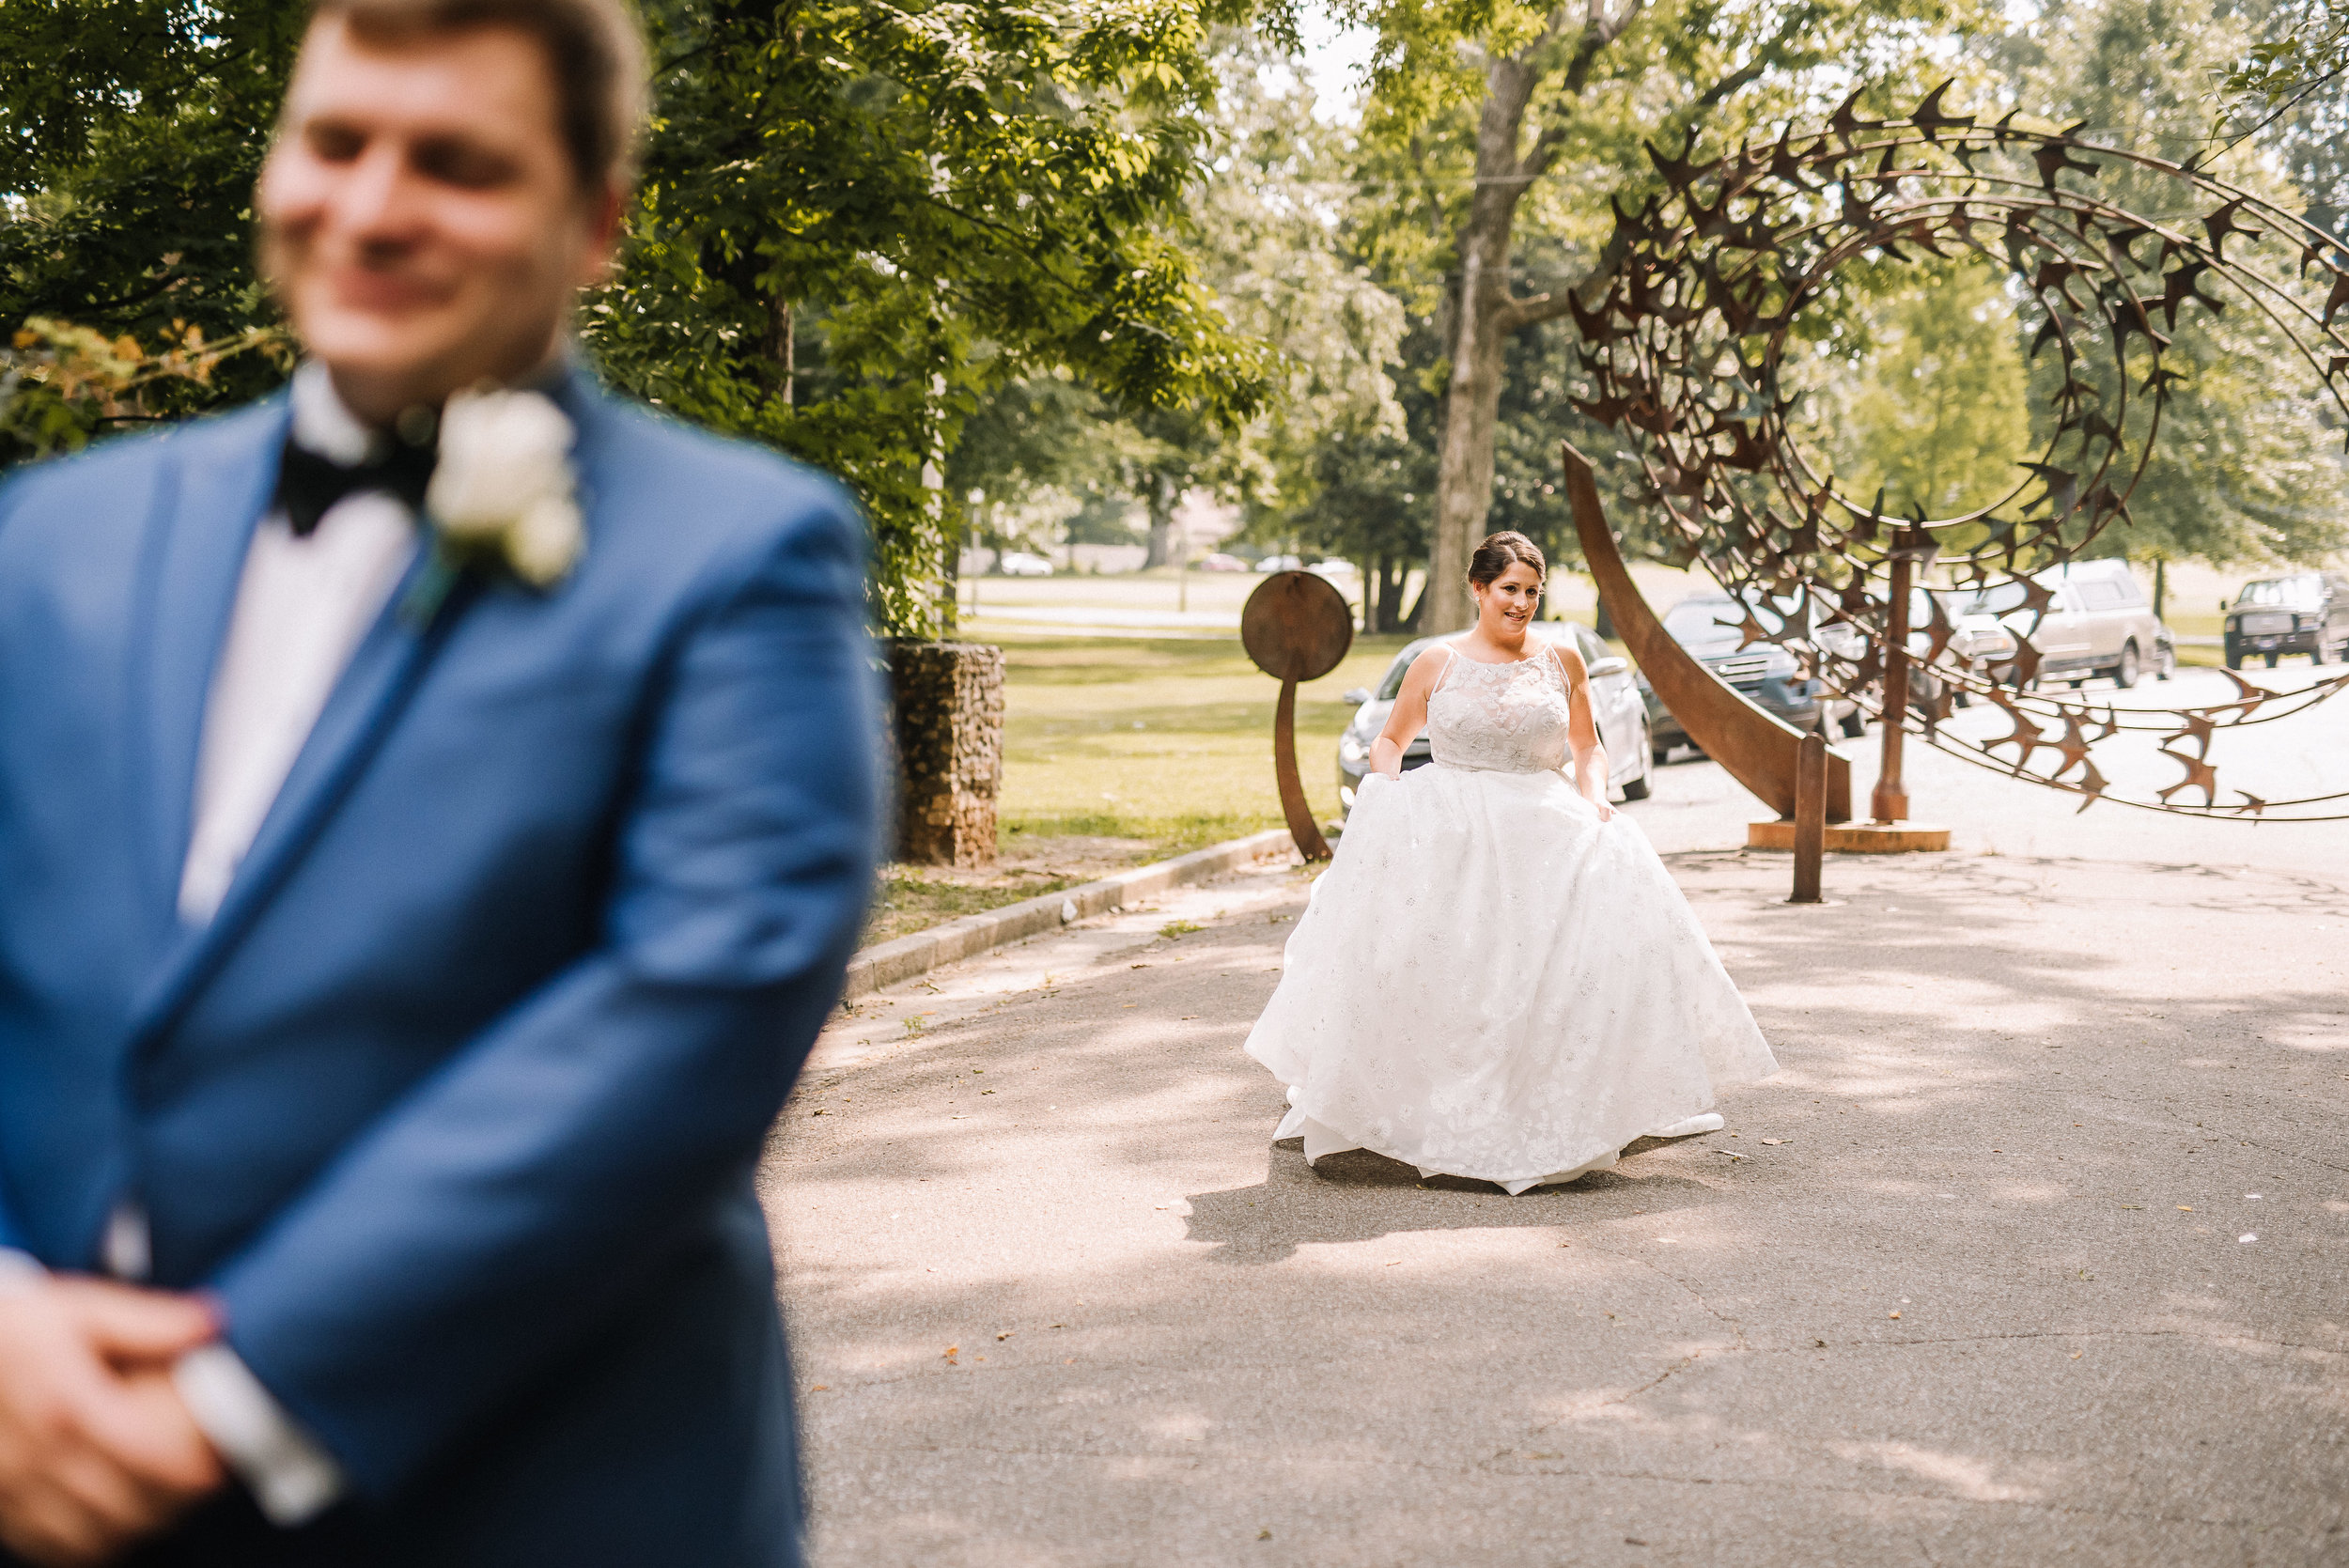 Smith Wedding_Memphis Zoo_Ashley Benham Photography-155.jpg